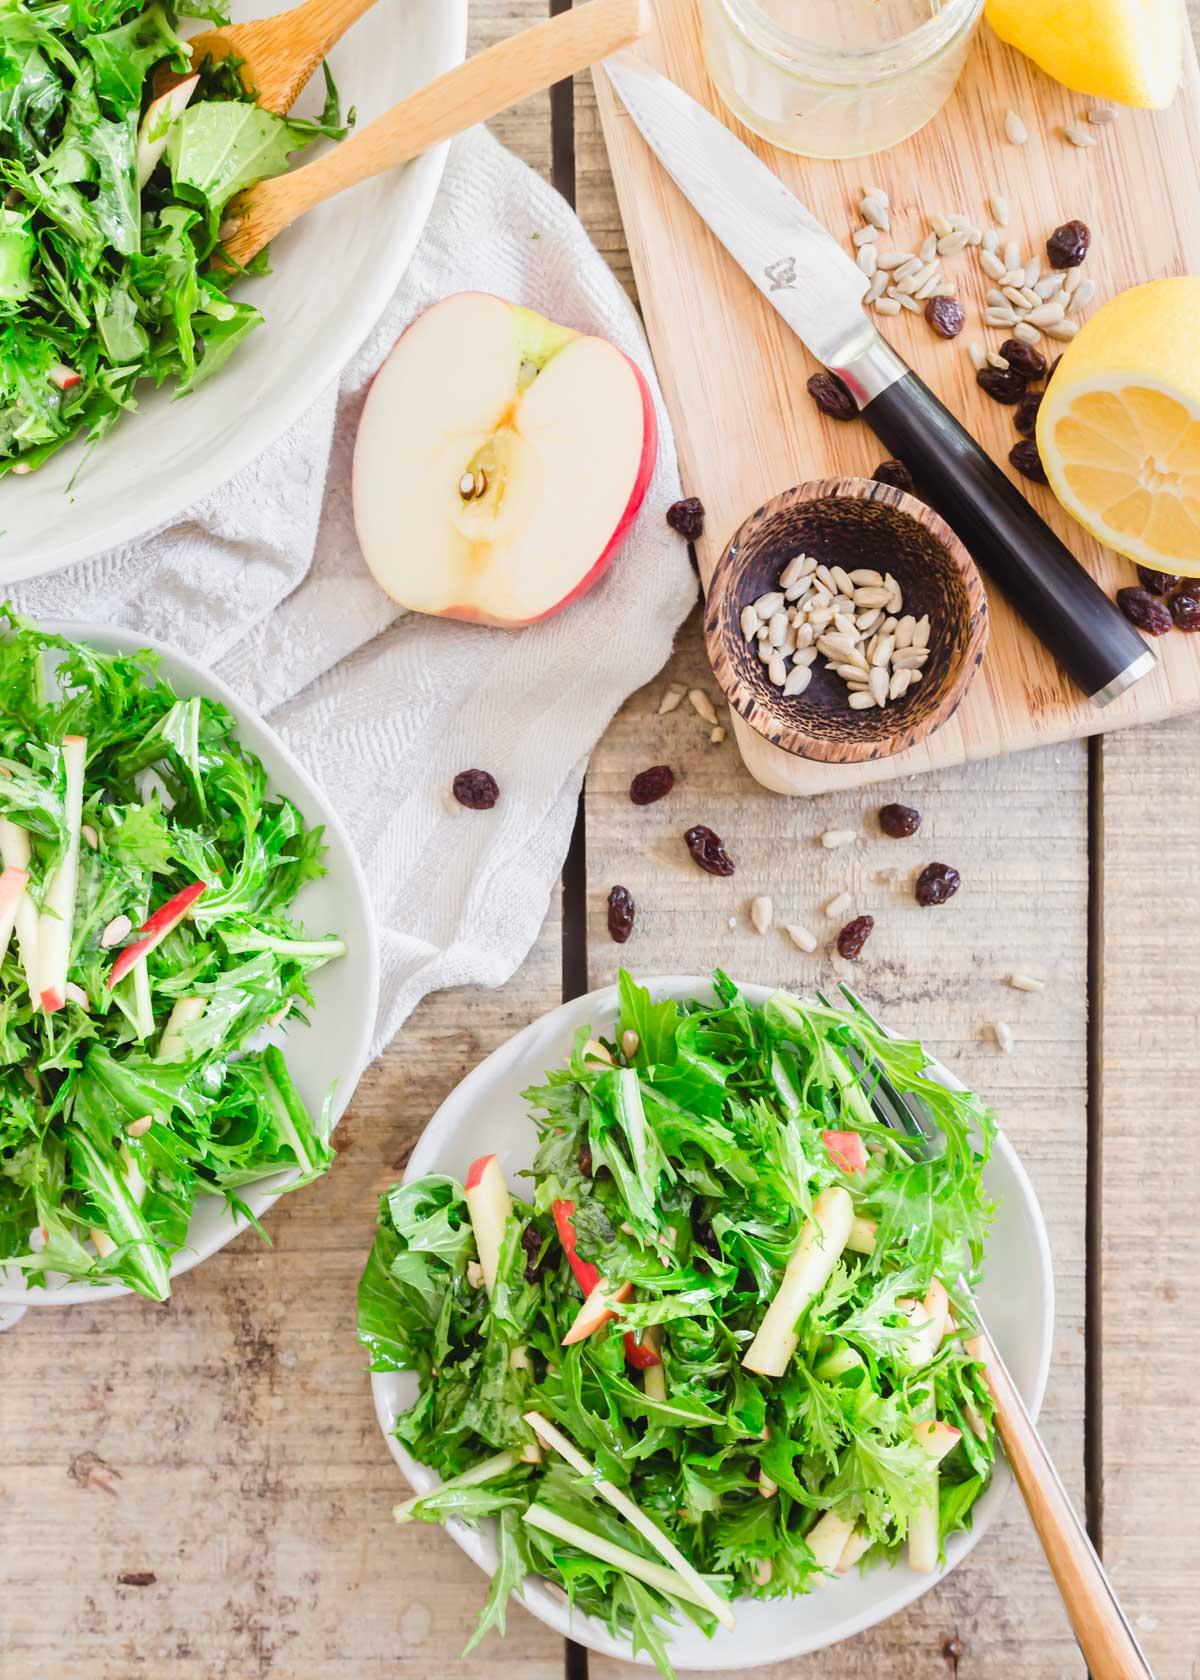 Mizuna greens salad with honey lemon dijon dressing on serving plates.